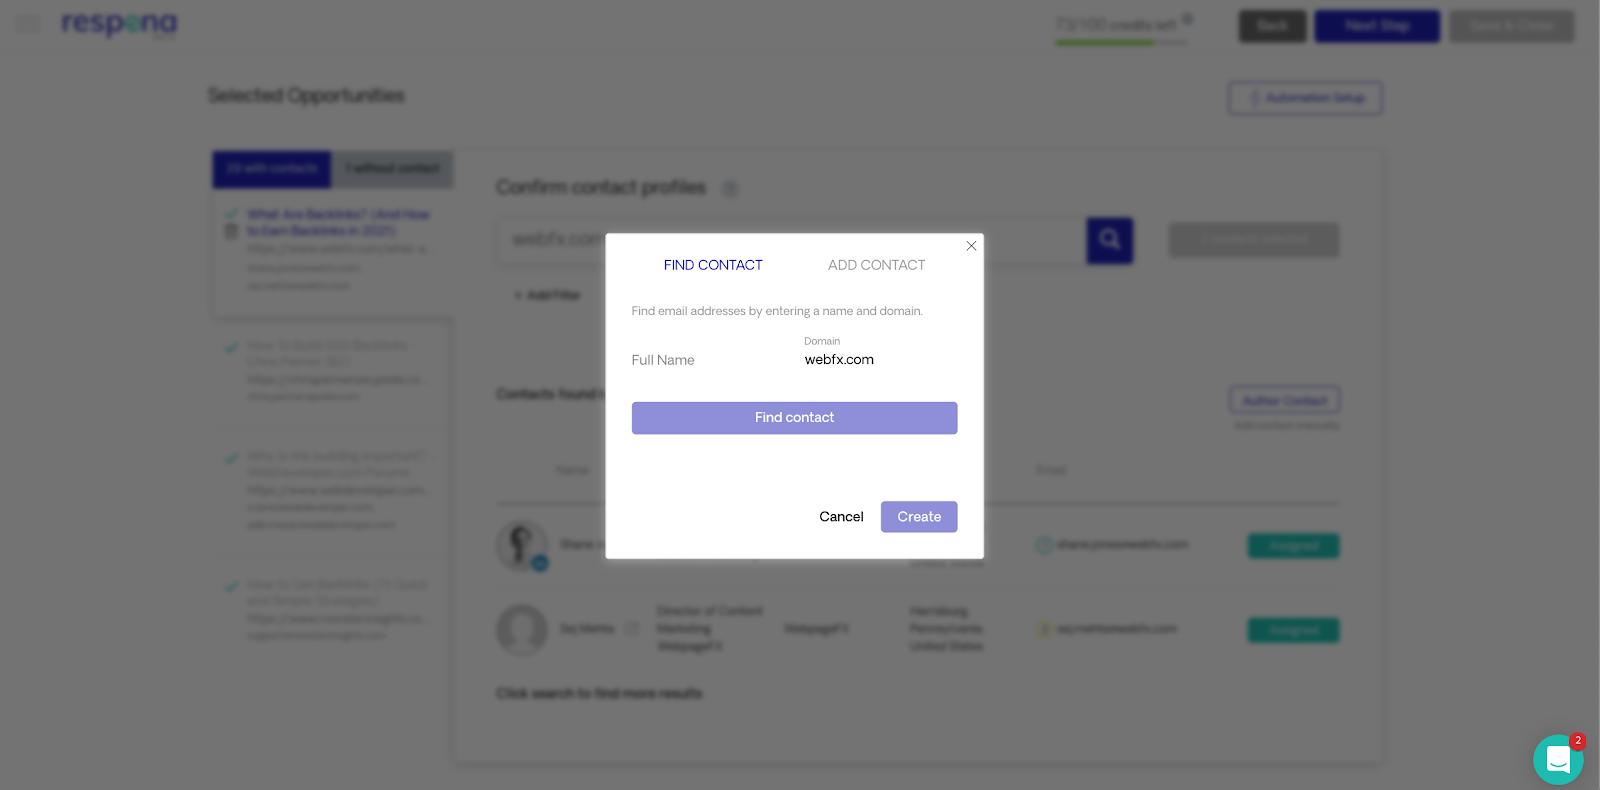 Respona manual email address verification